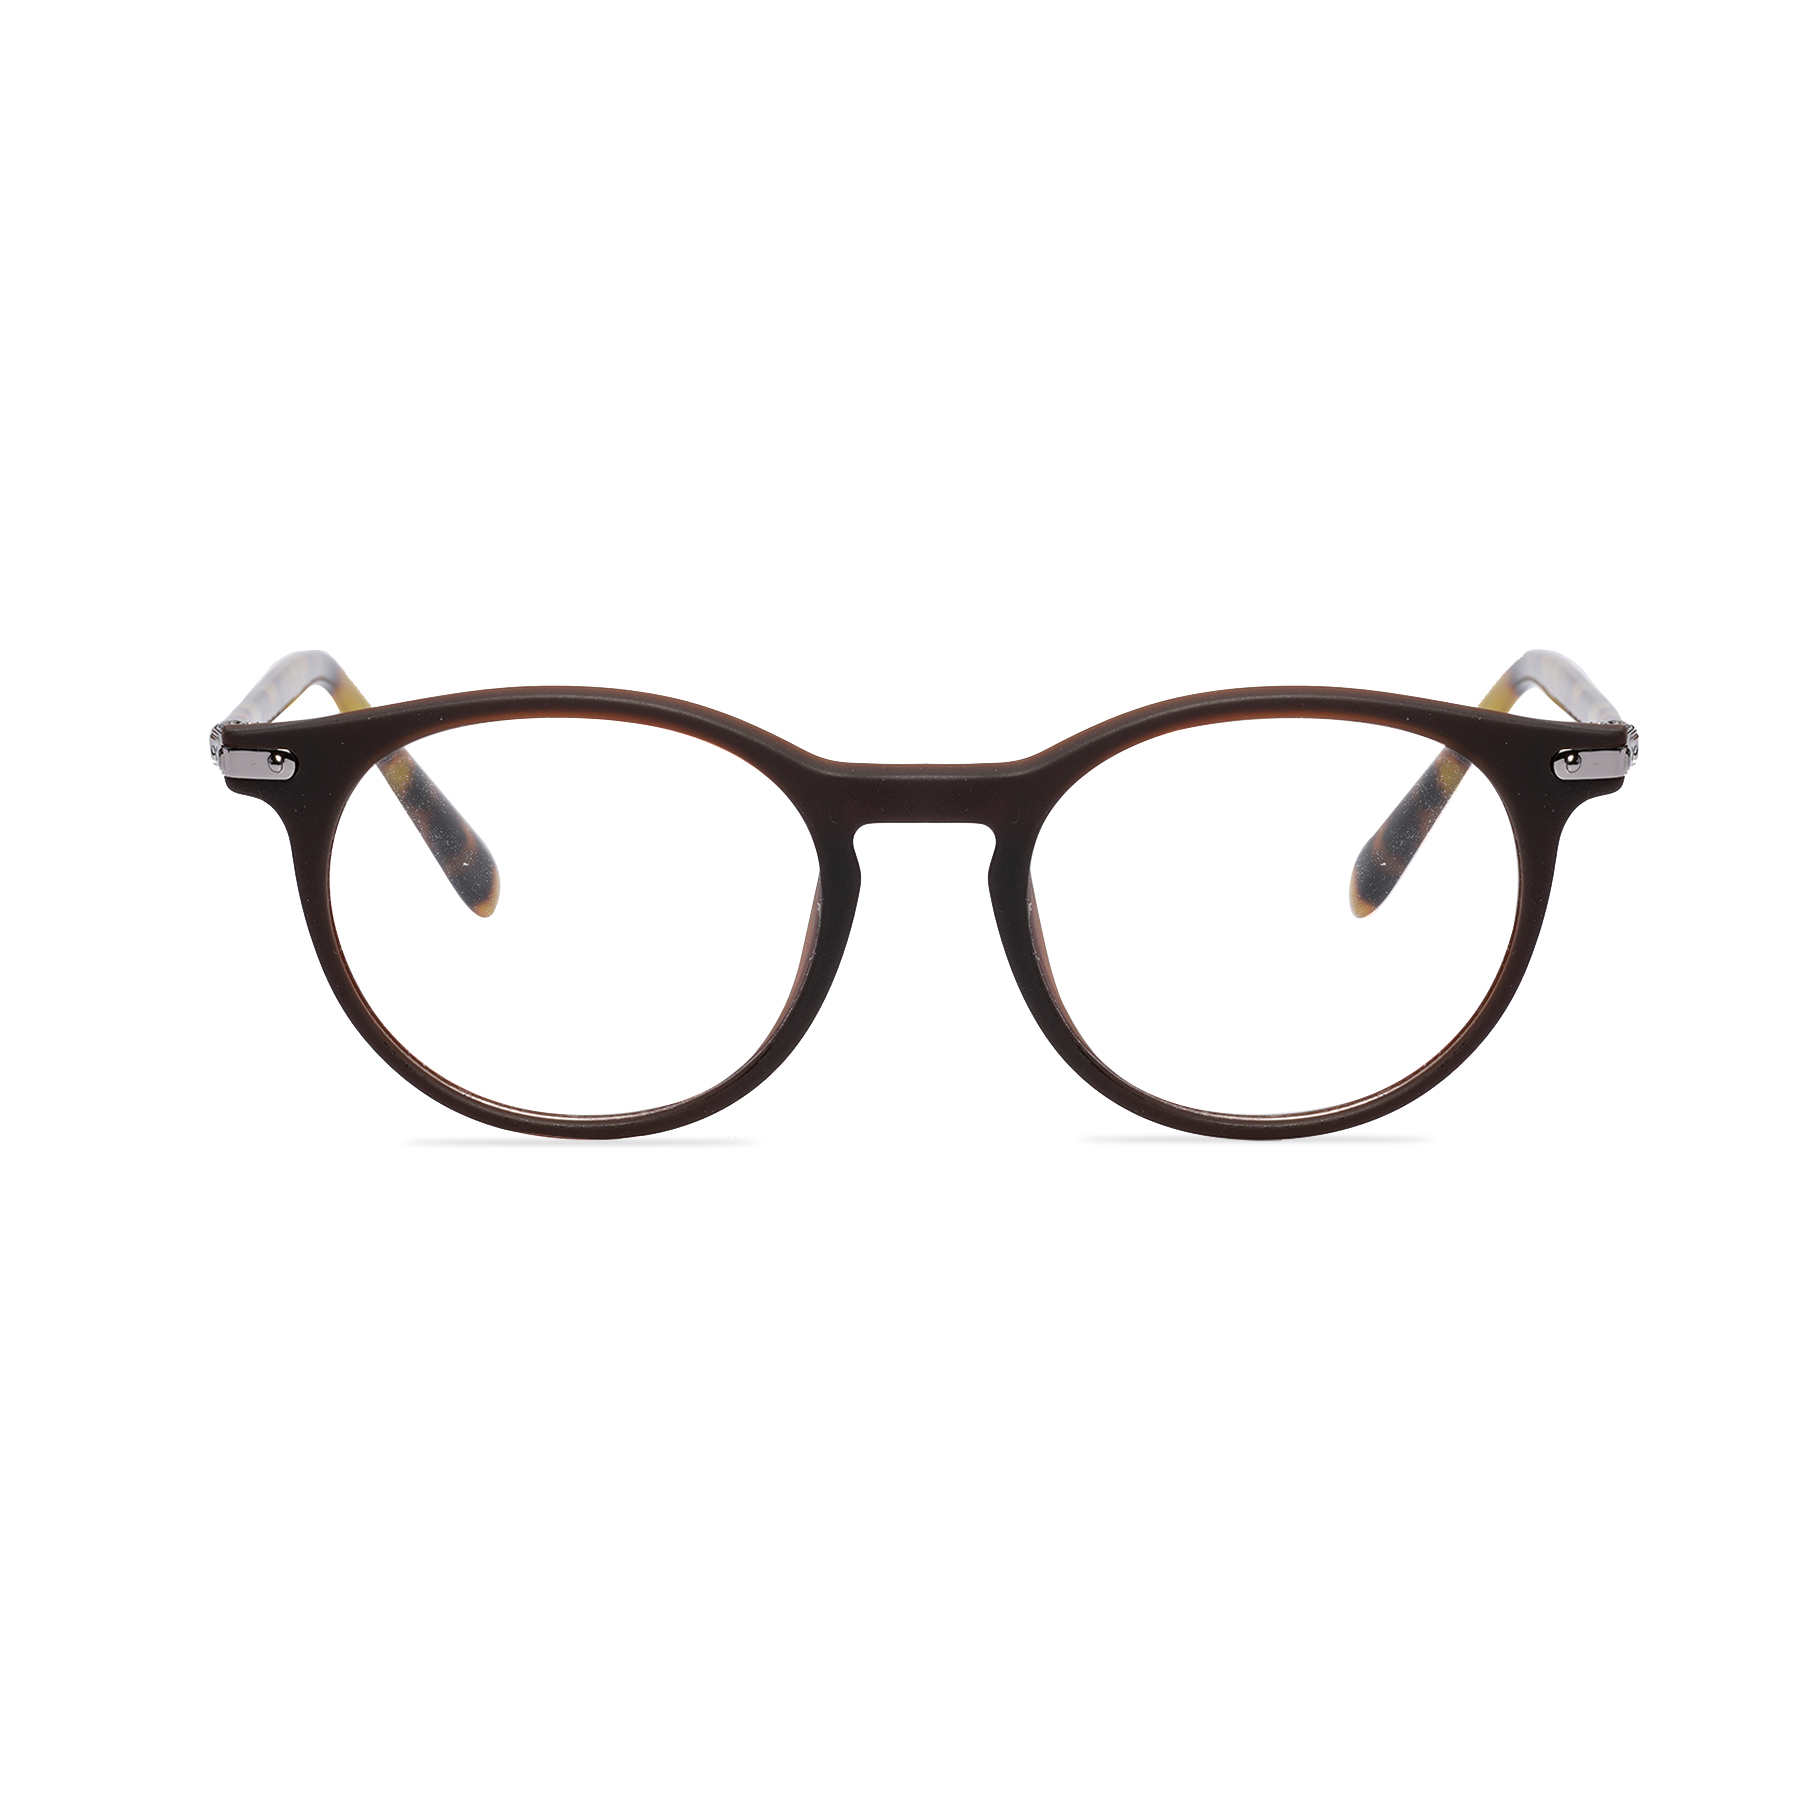 Vinaldi Plus VP001 Optical Frames